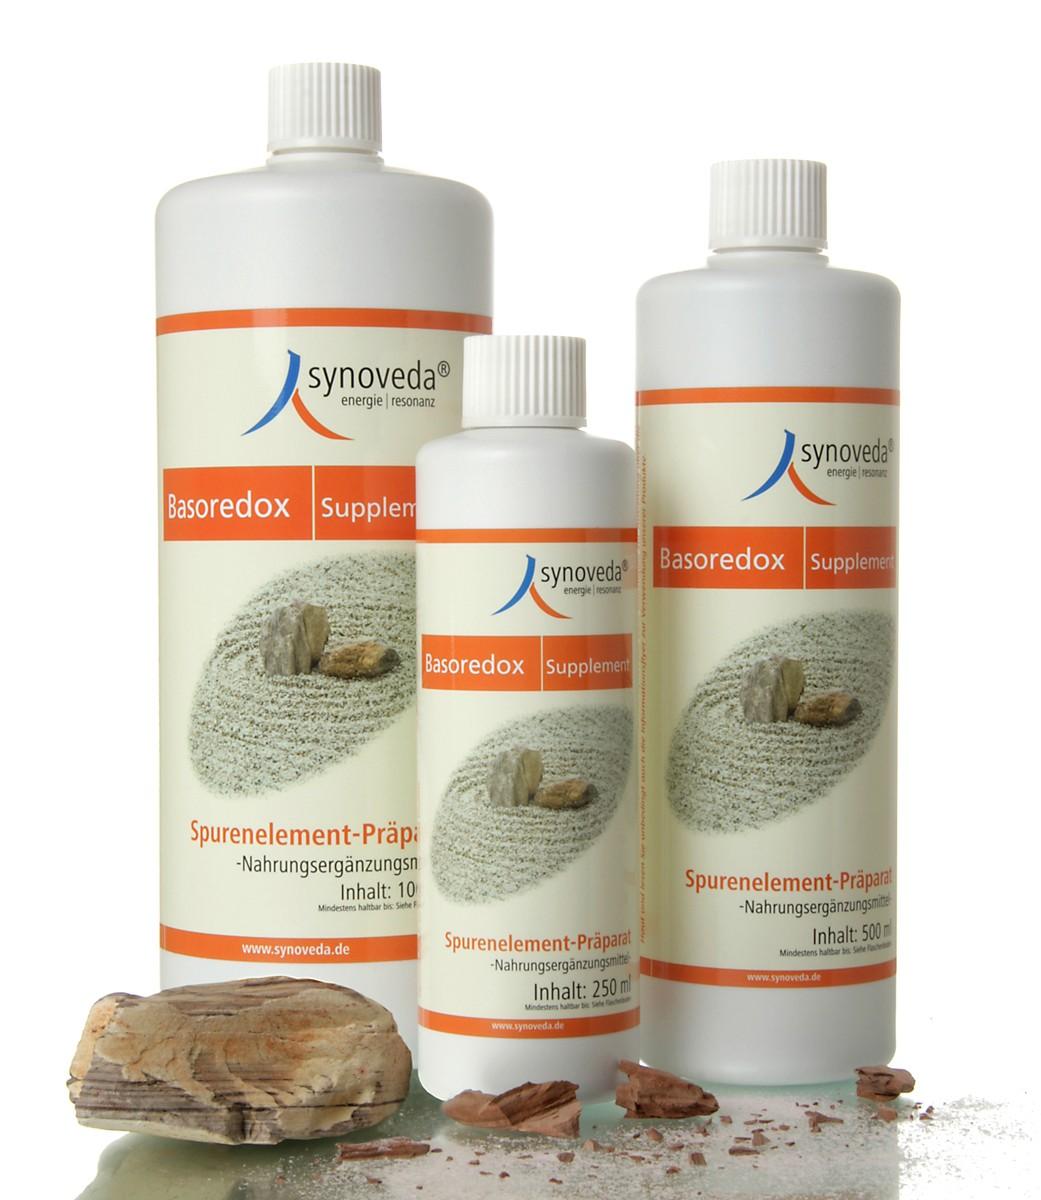 Synoveda Basoredox Supplement